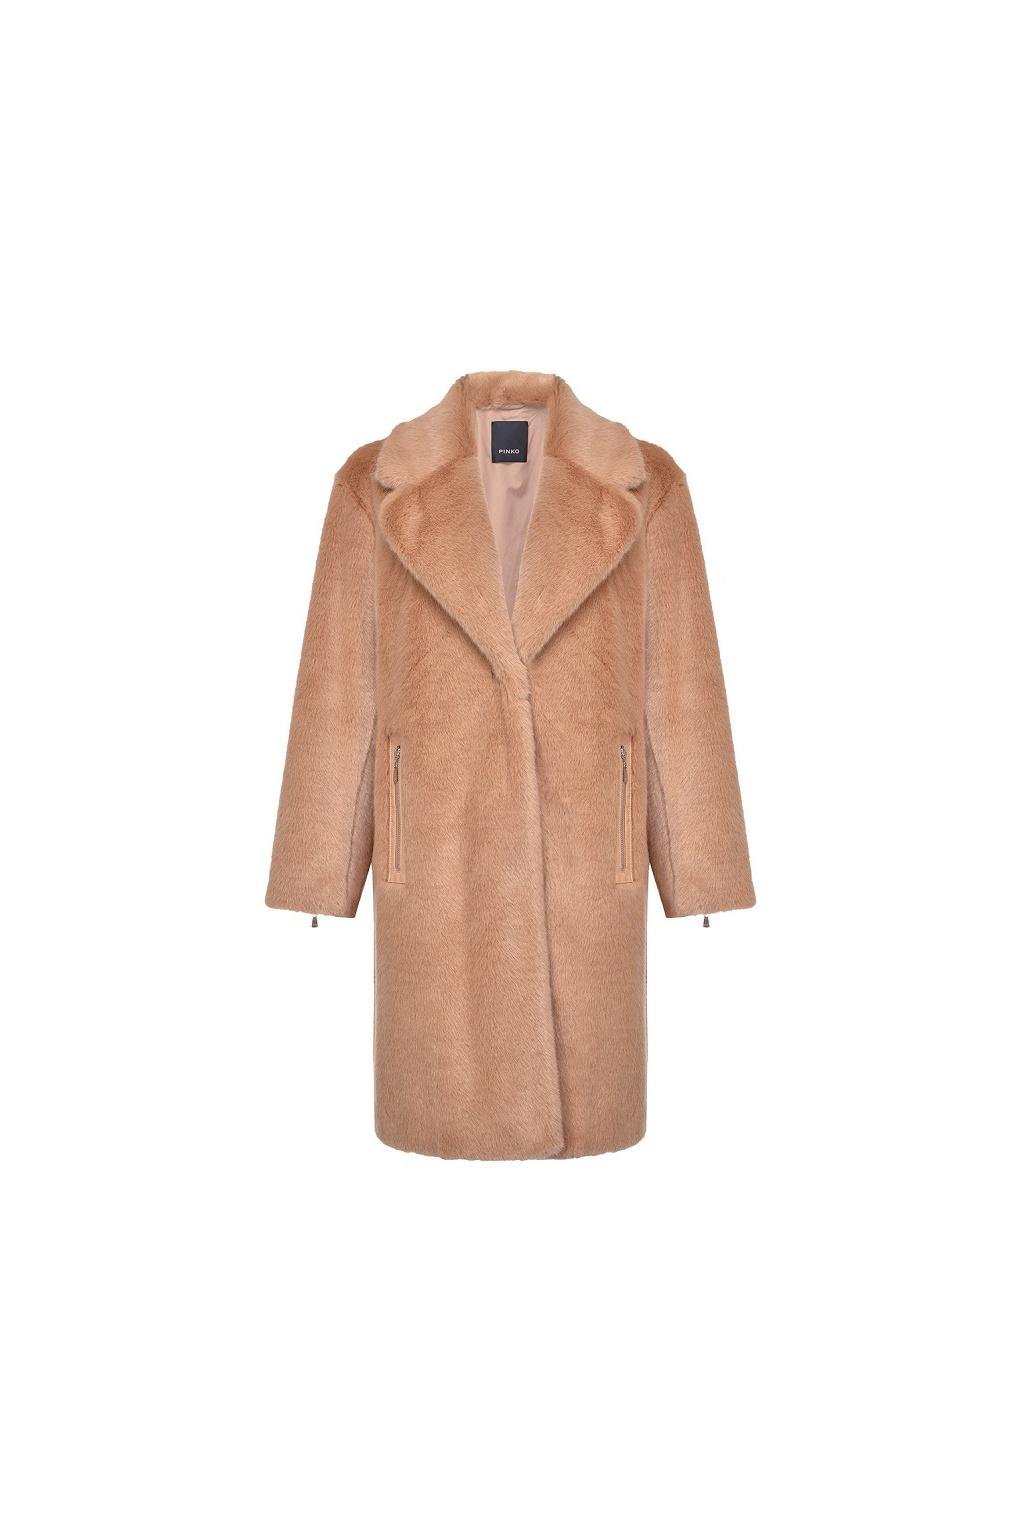 1G1556Y6BR C81 Dámský kabát Pinko Evaristo béžový